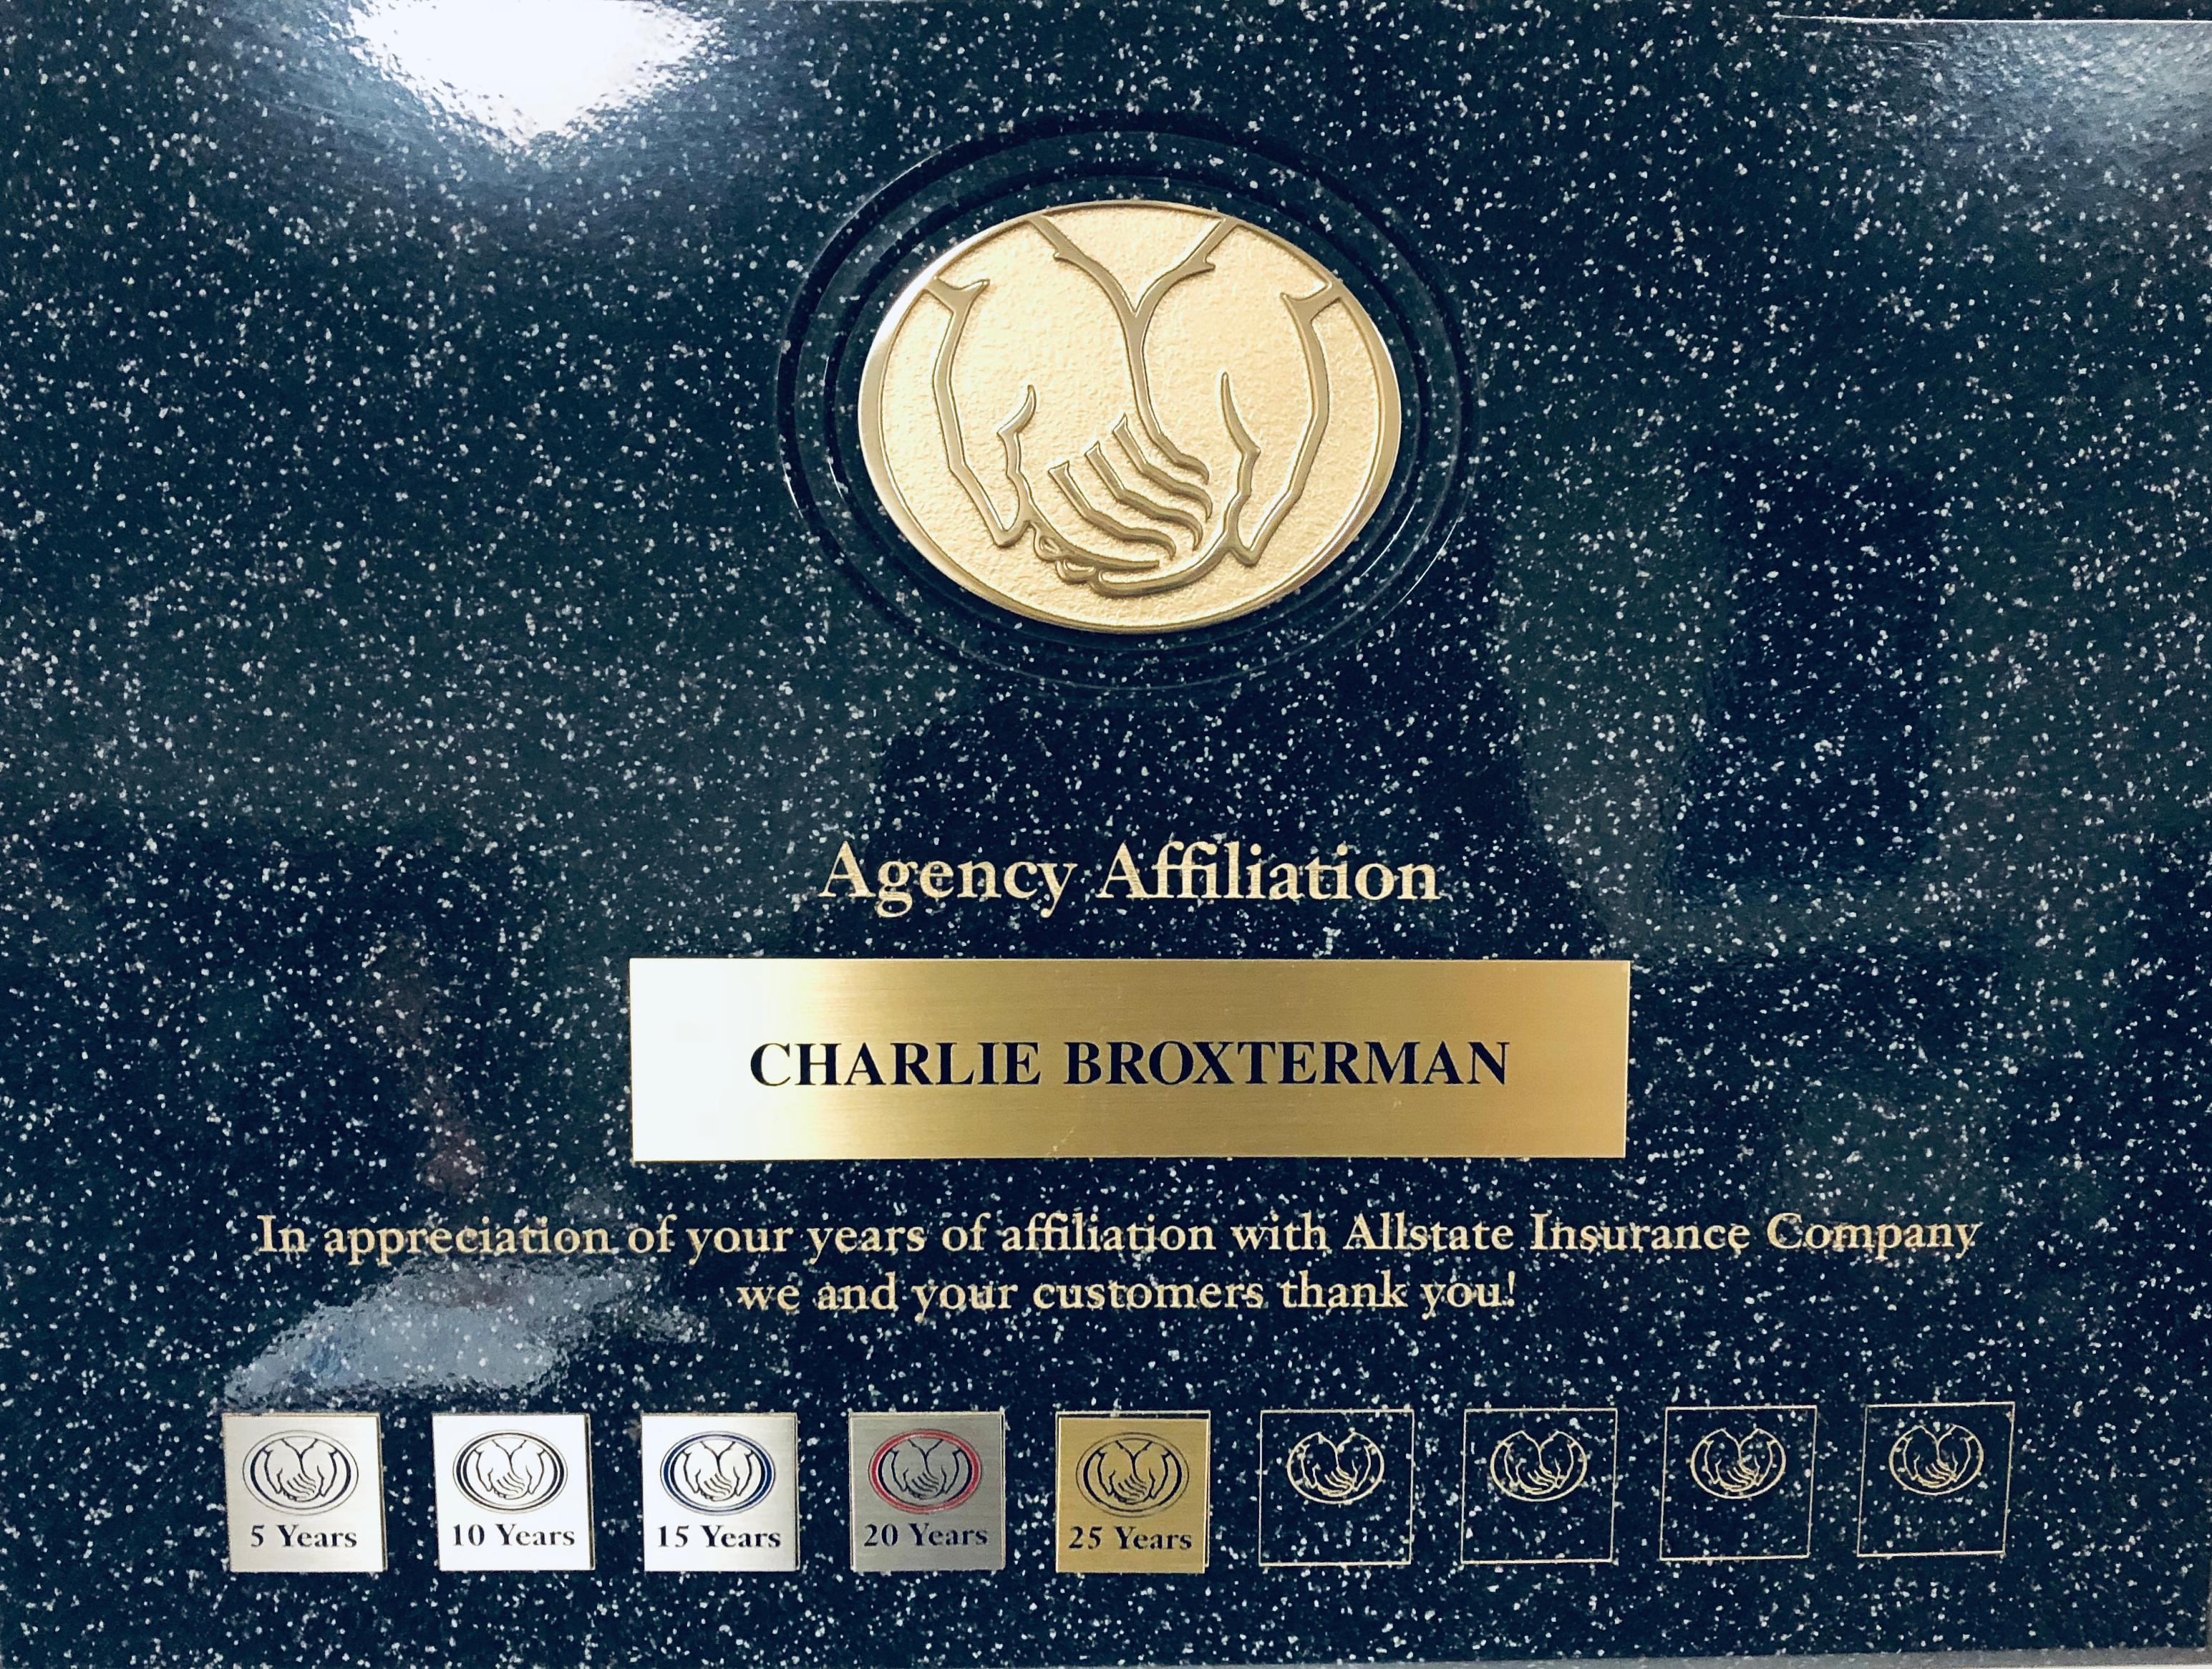 Charlie Broxterman: Allstate Insurance image 8